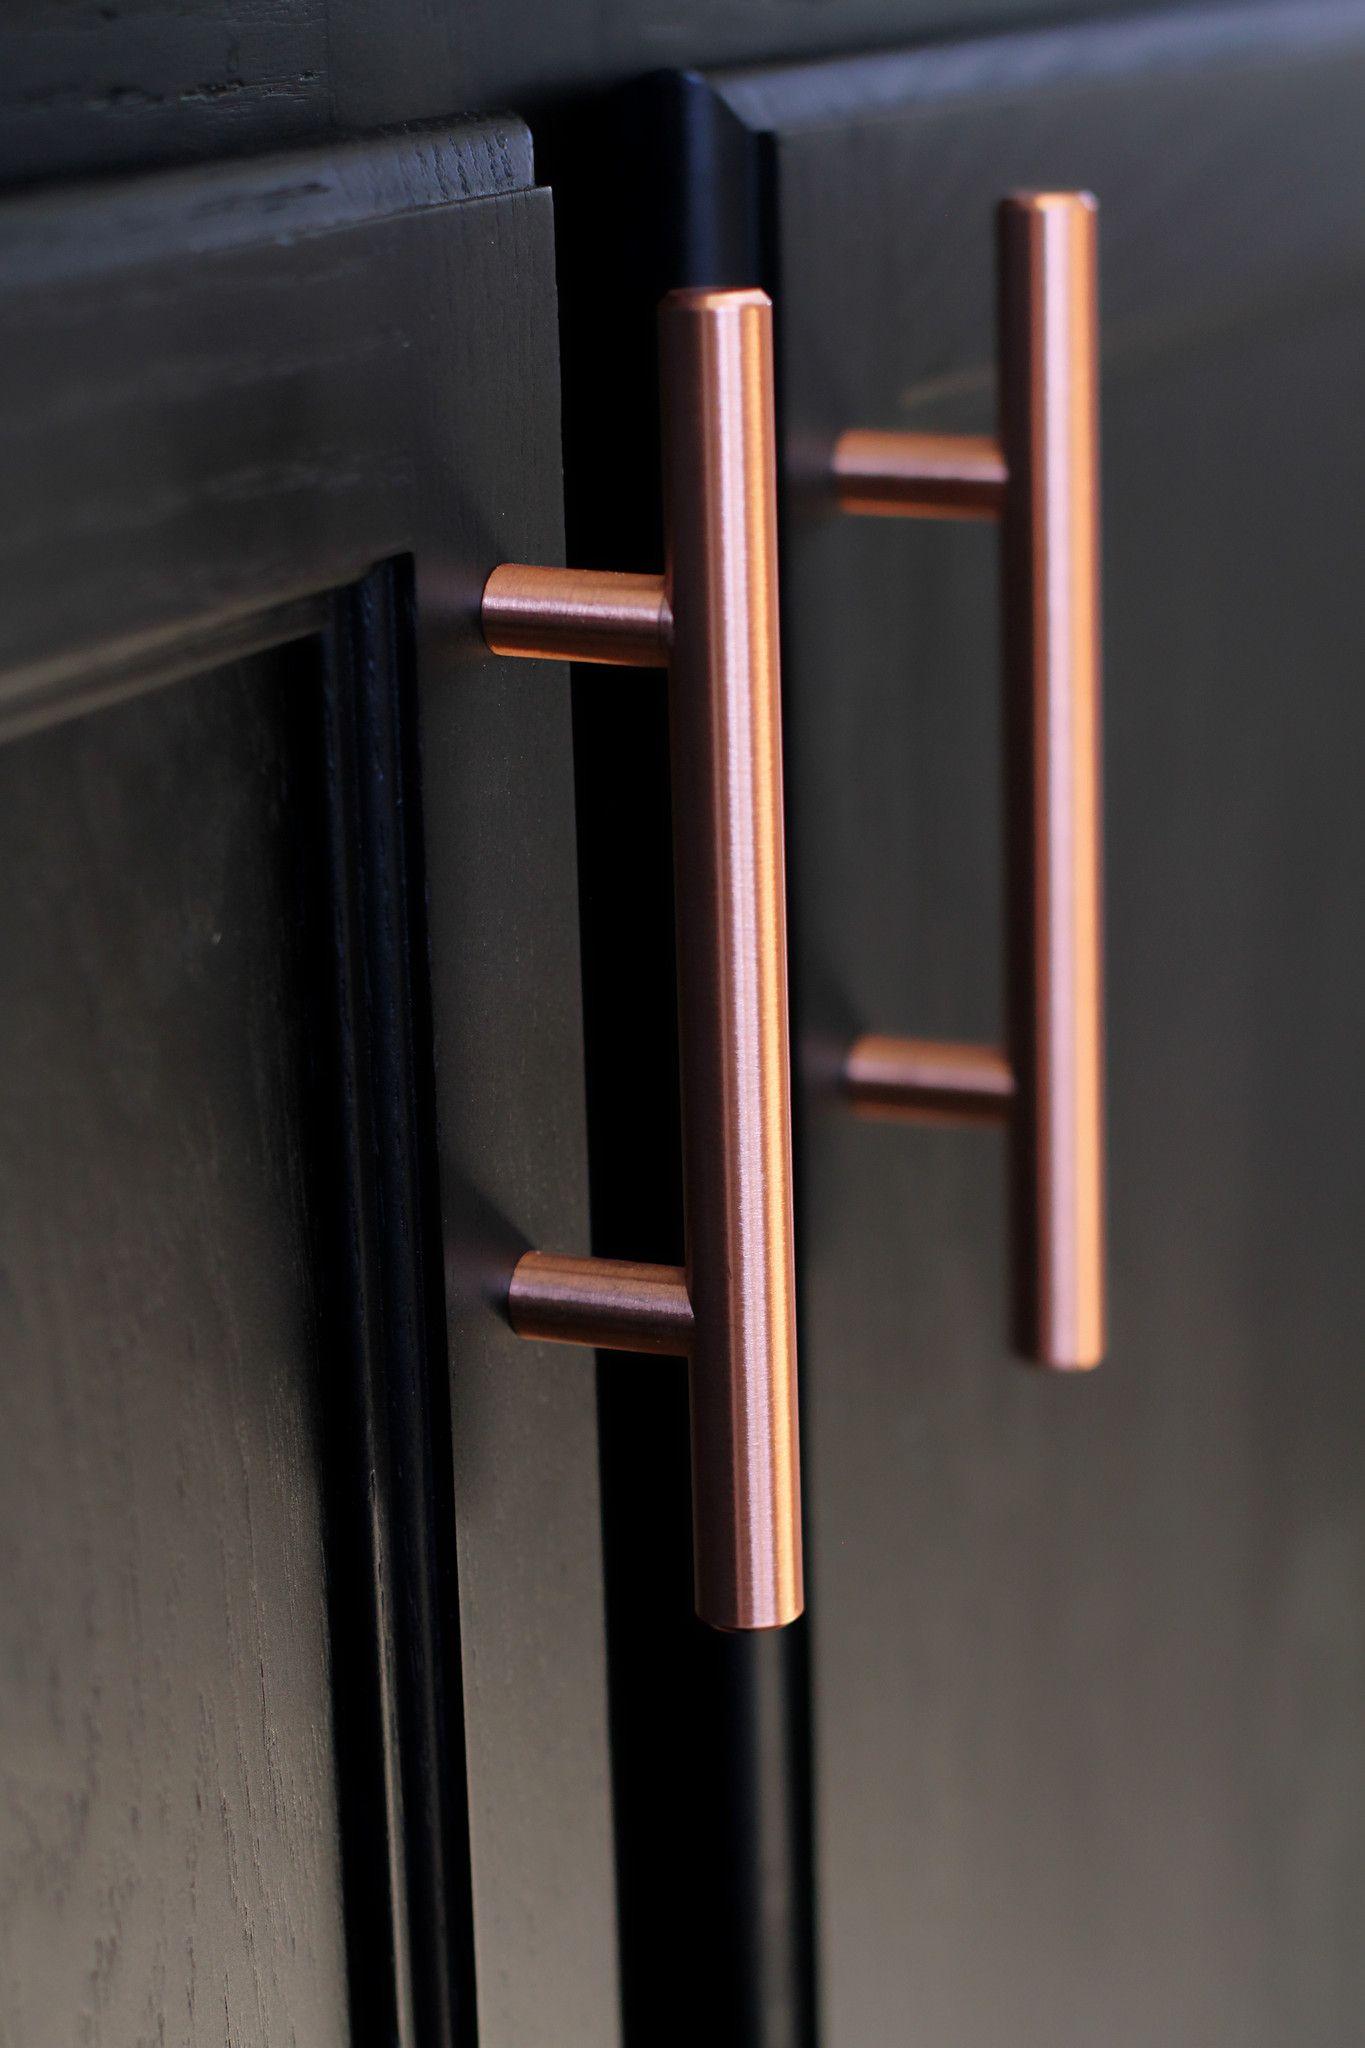 Satin Copper Cabinet Hardware Euro Style Bar Handle Pull - 3  Hole Centers 5 & Satin Copper Cabinet Hardware Euro Style Bar Handle Pull - 3